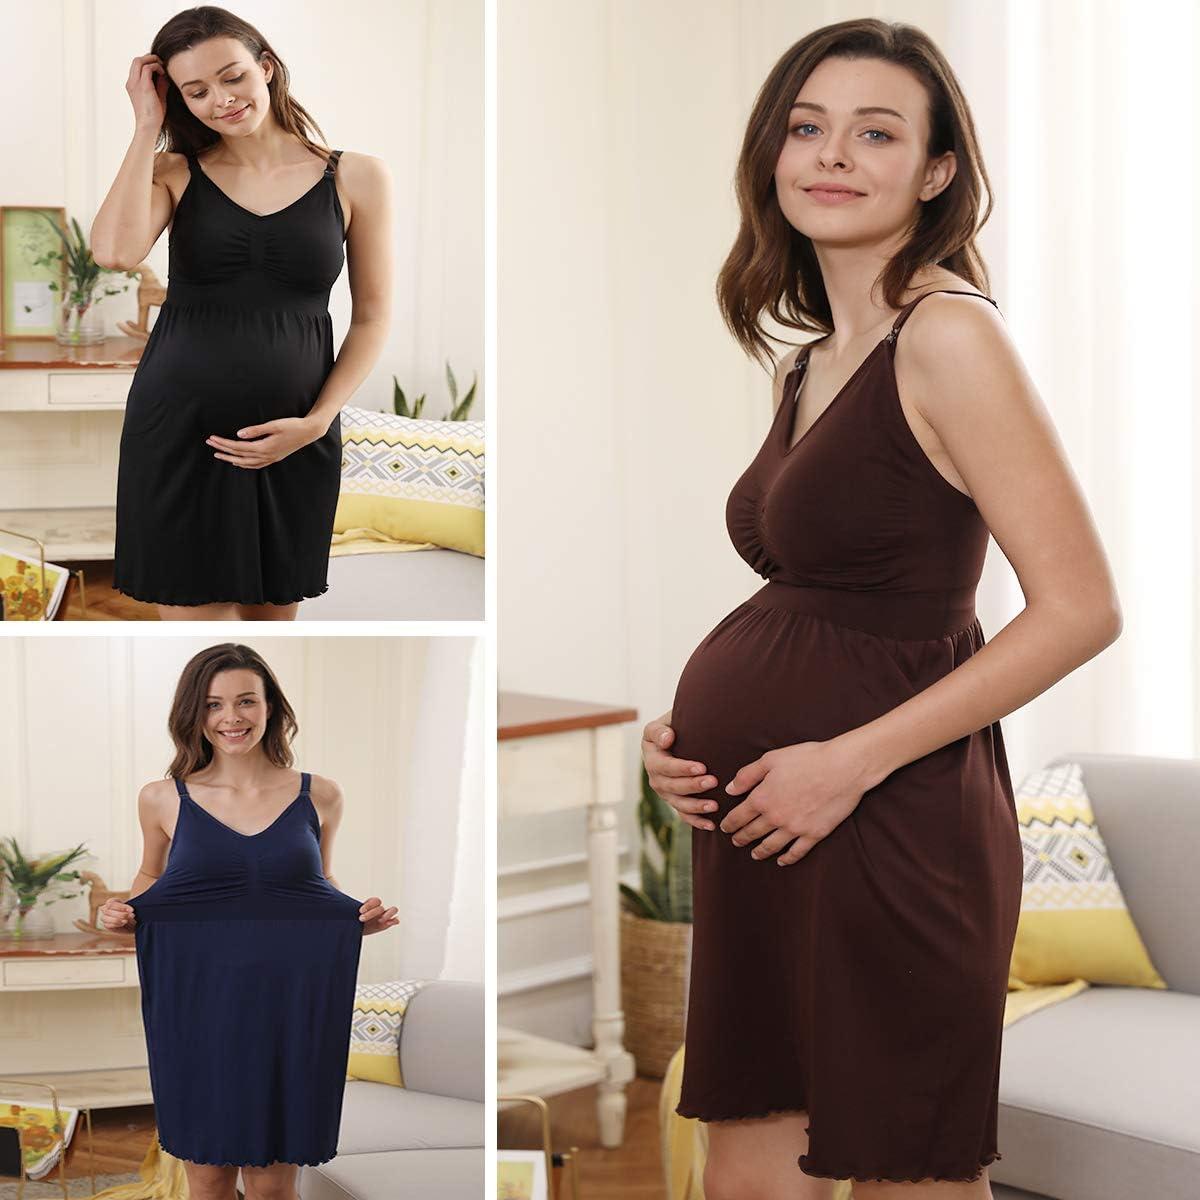 iloveSIA Women's Plus Size Maternity Nightgown Breastfeeding Sleeveless Cami Shirt Casual Nursing Dress Pack of 2